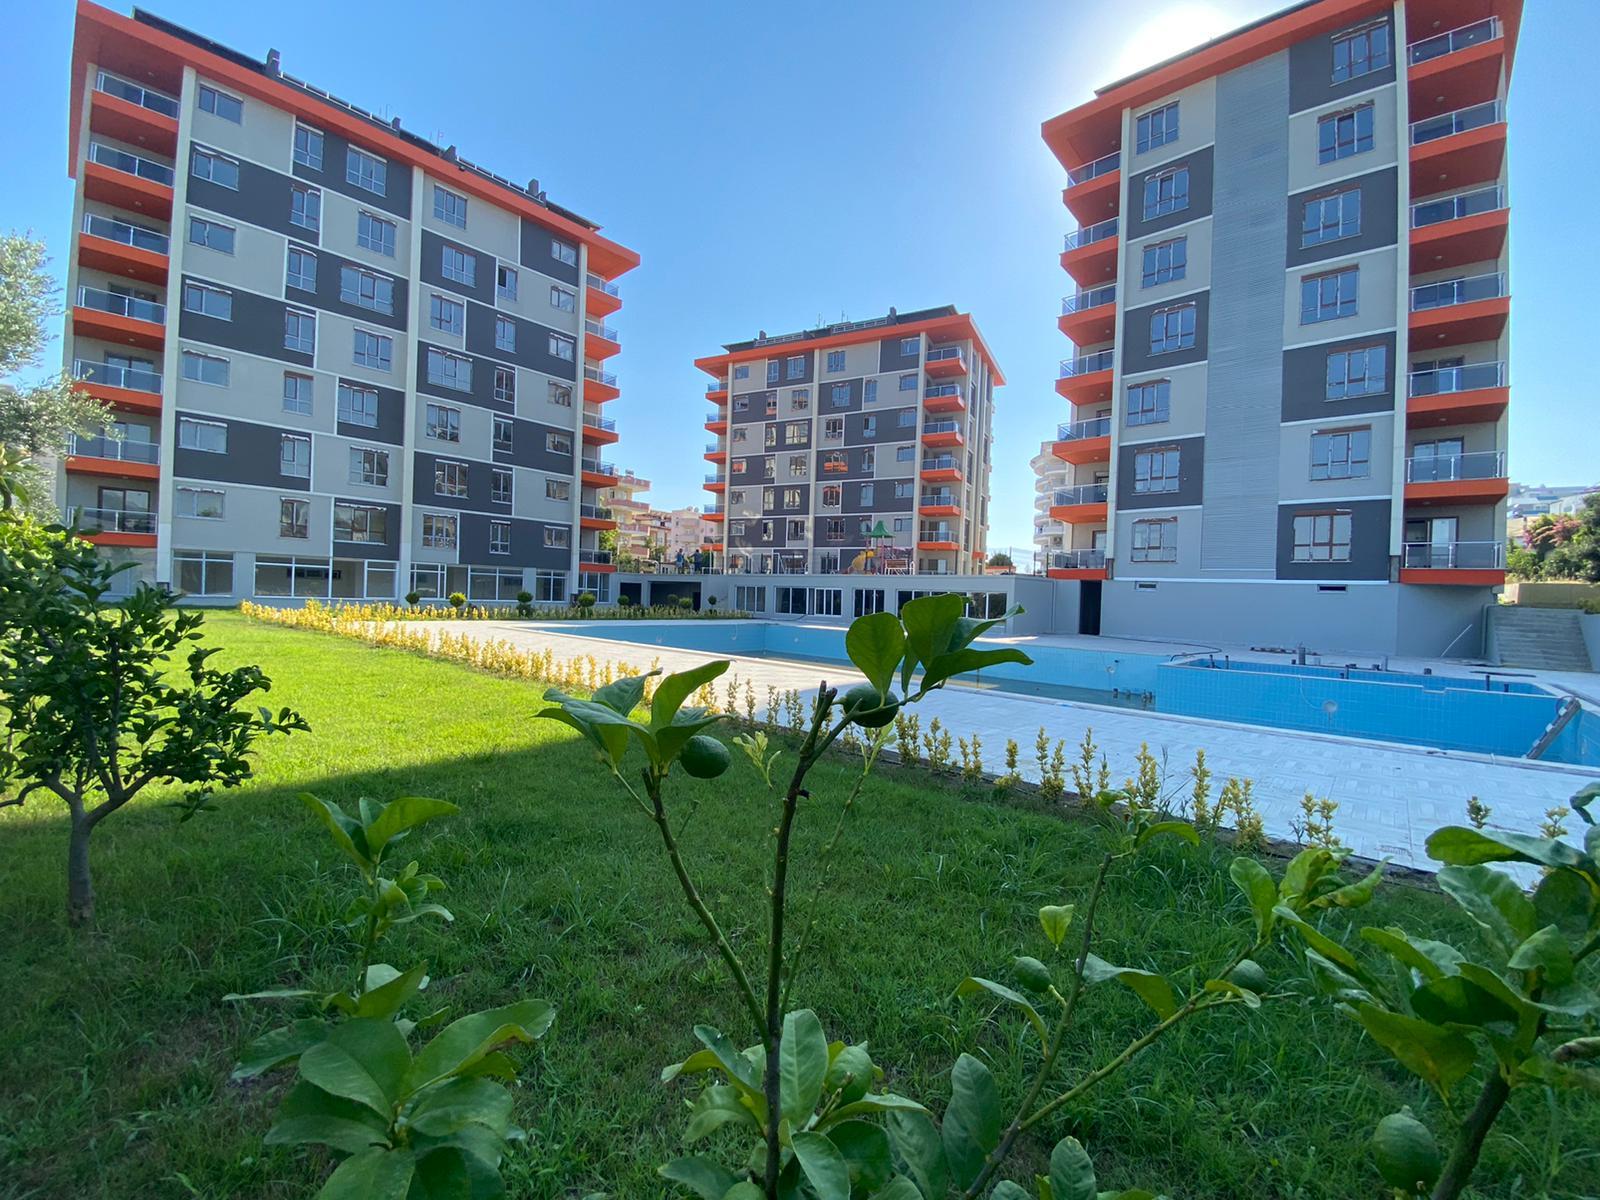 «MARİNE 84 residence»- Авсаллар